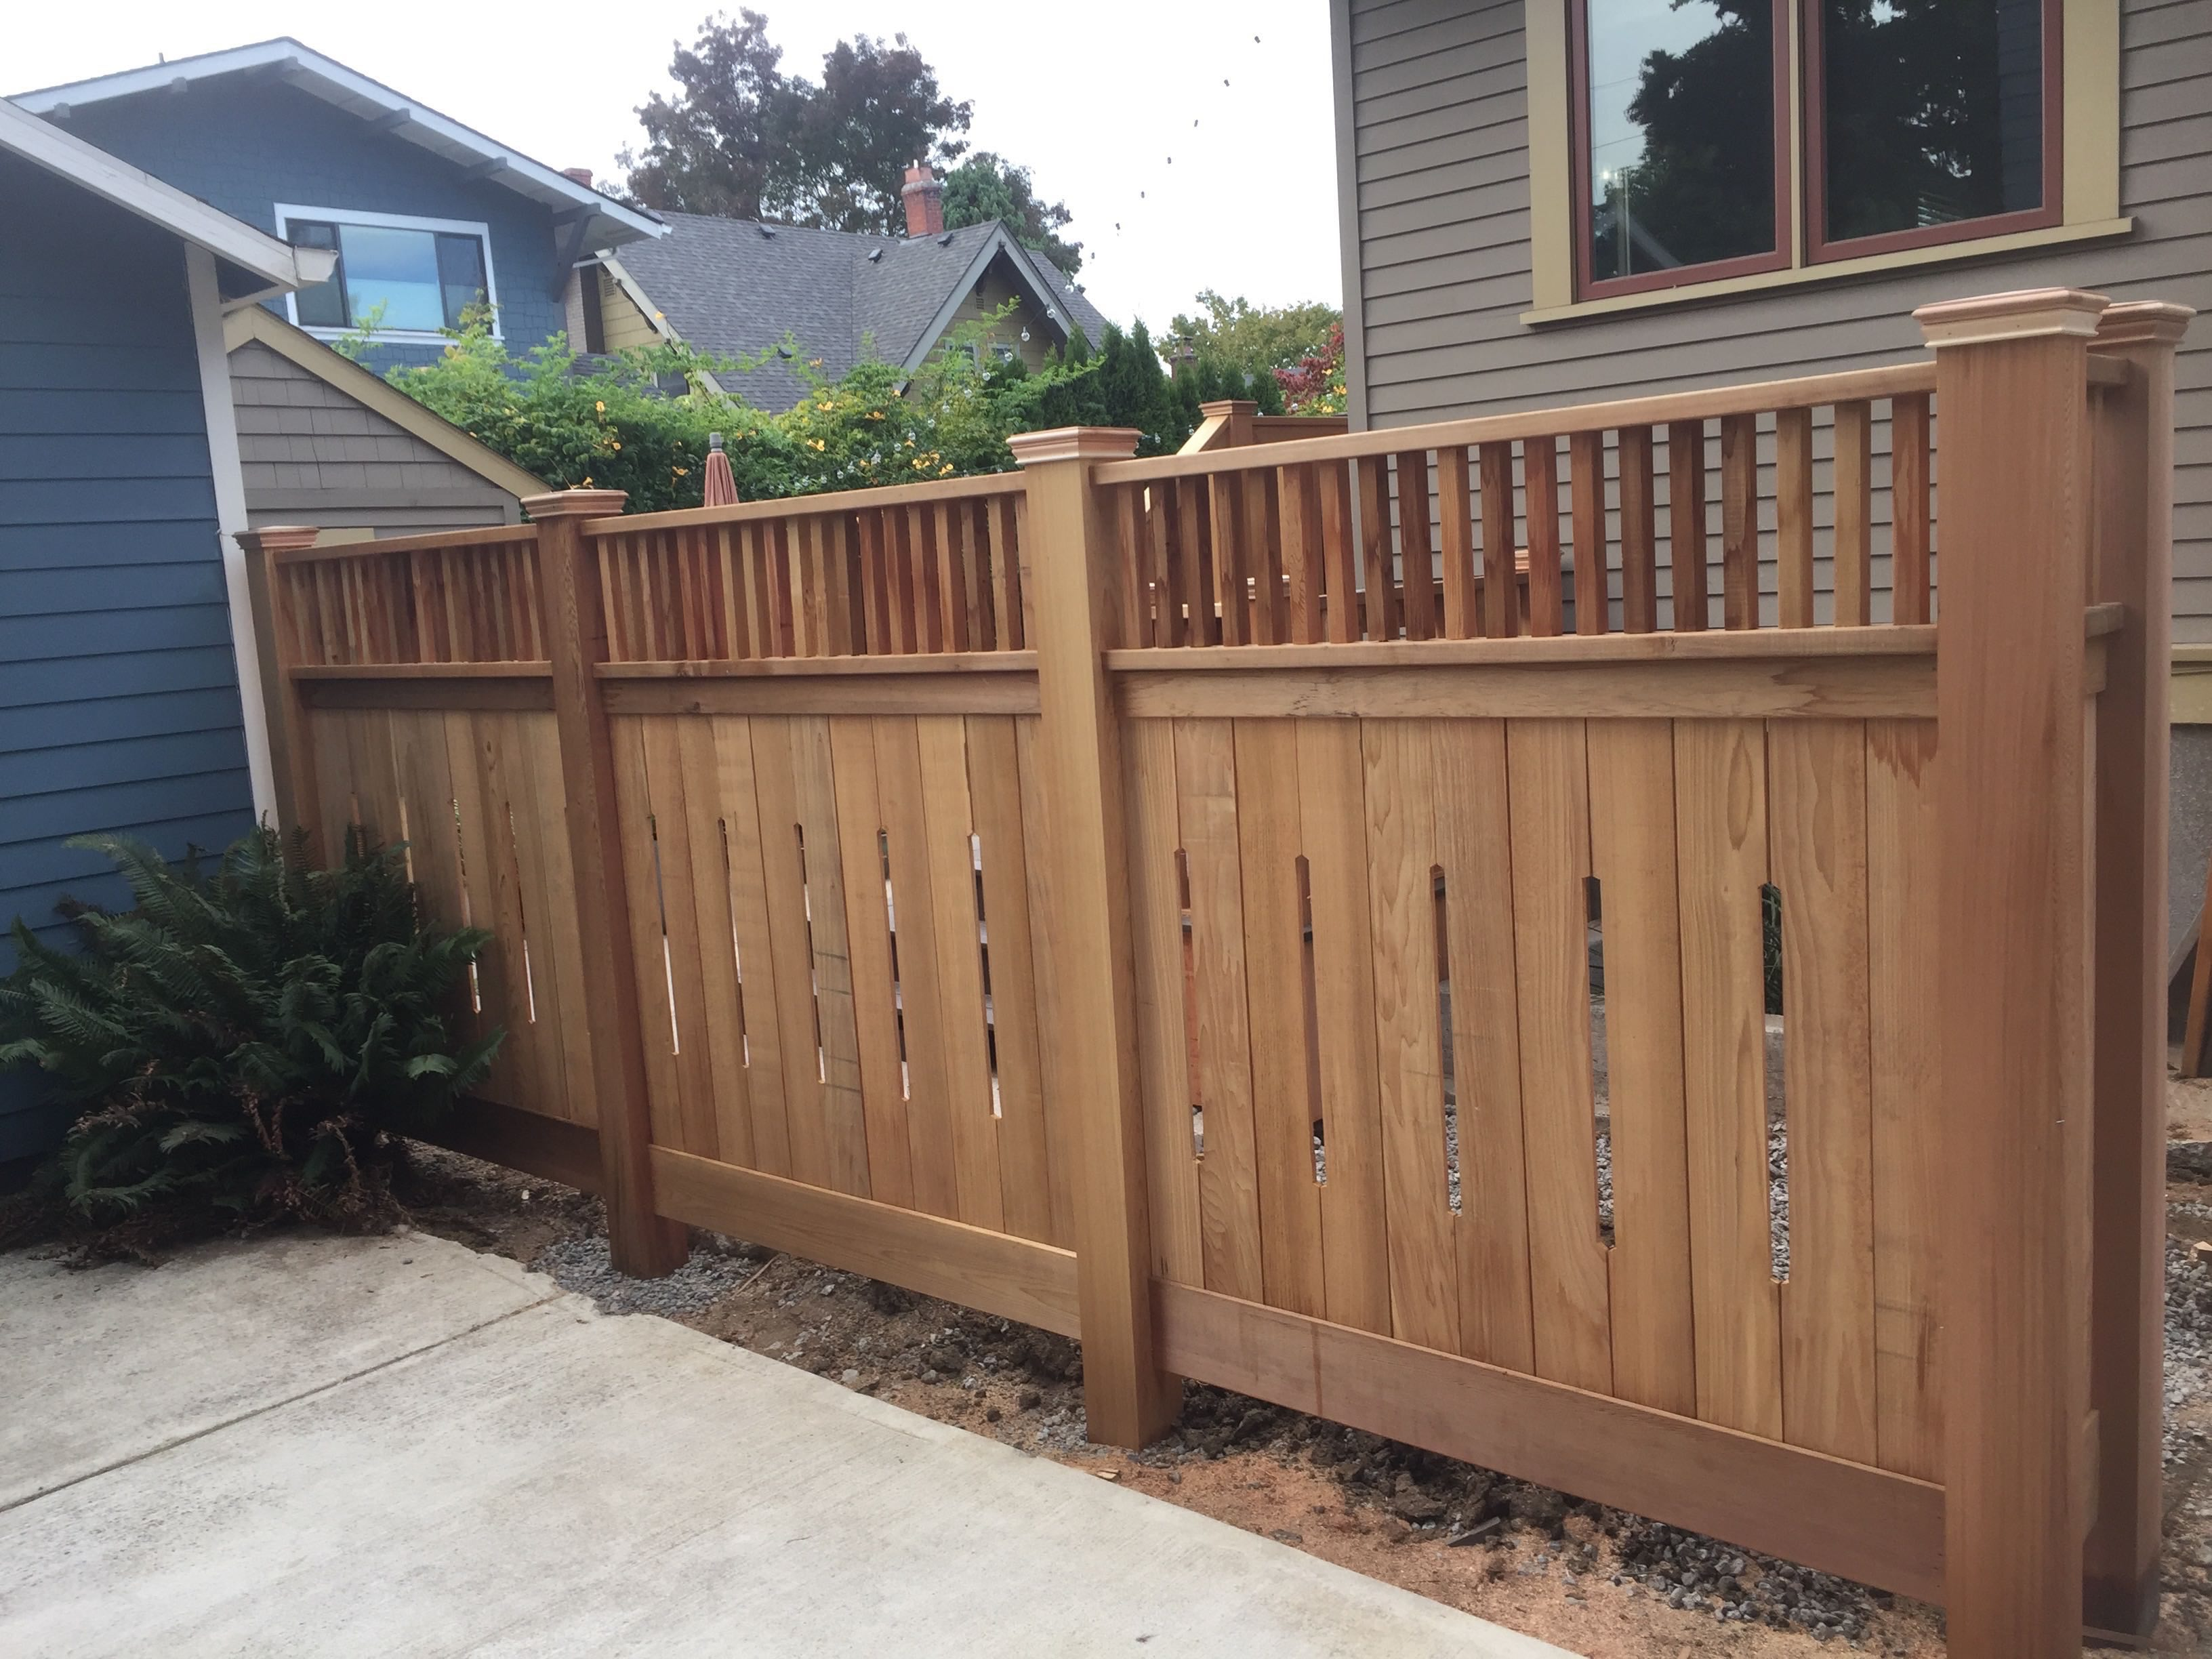 lear Cedar custom fence with 6x6 posts